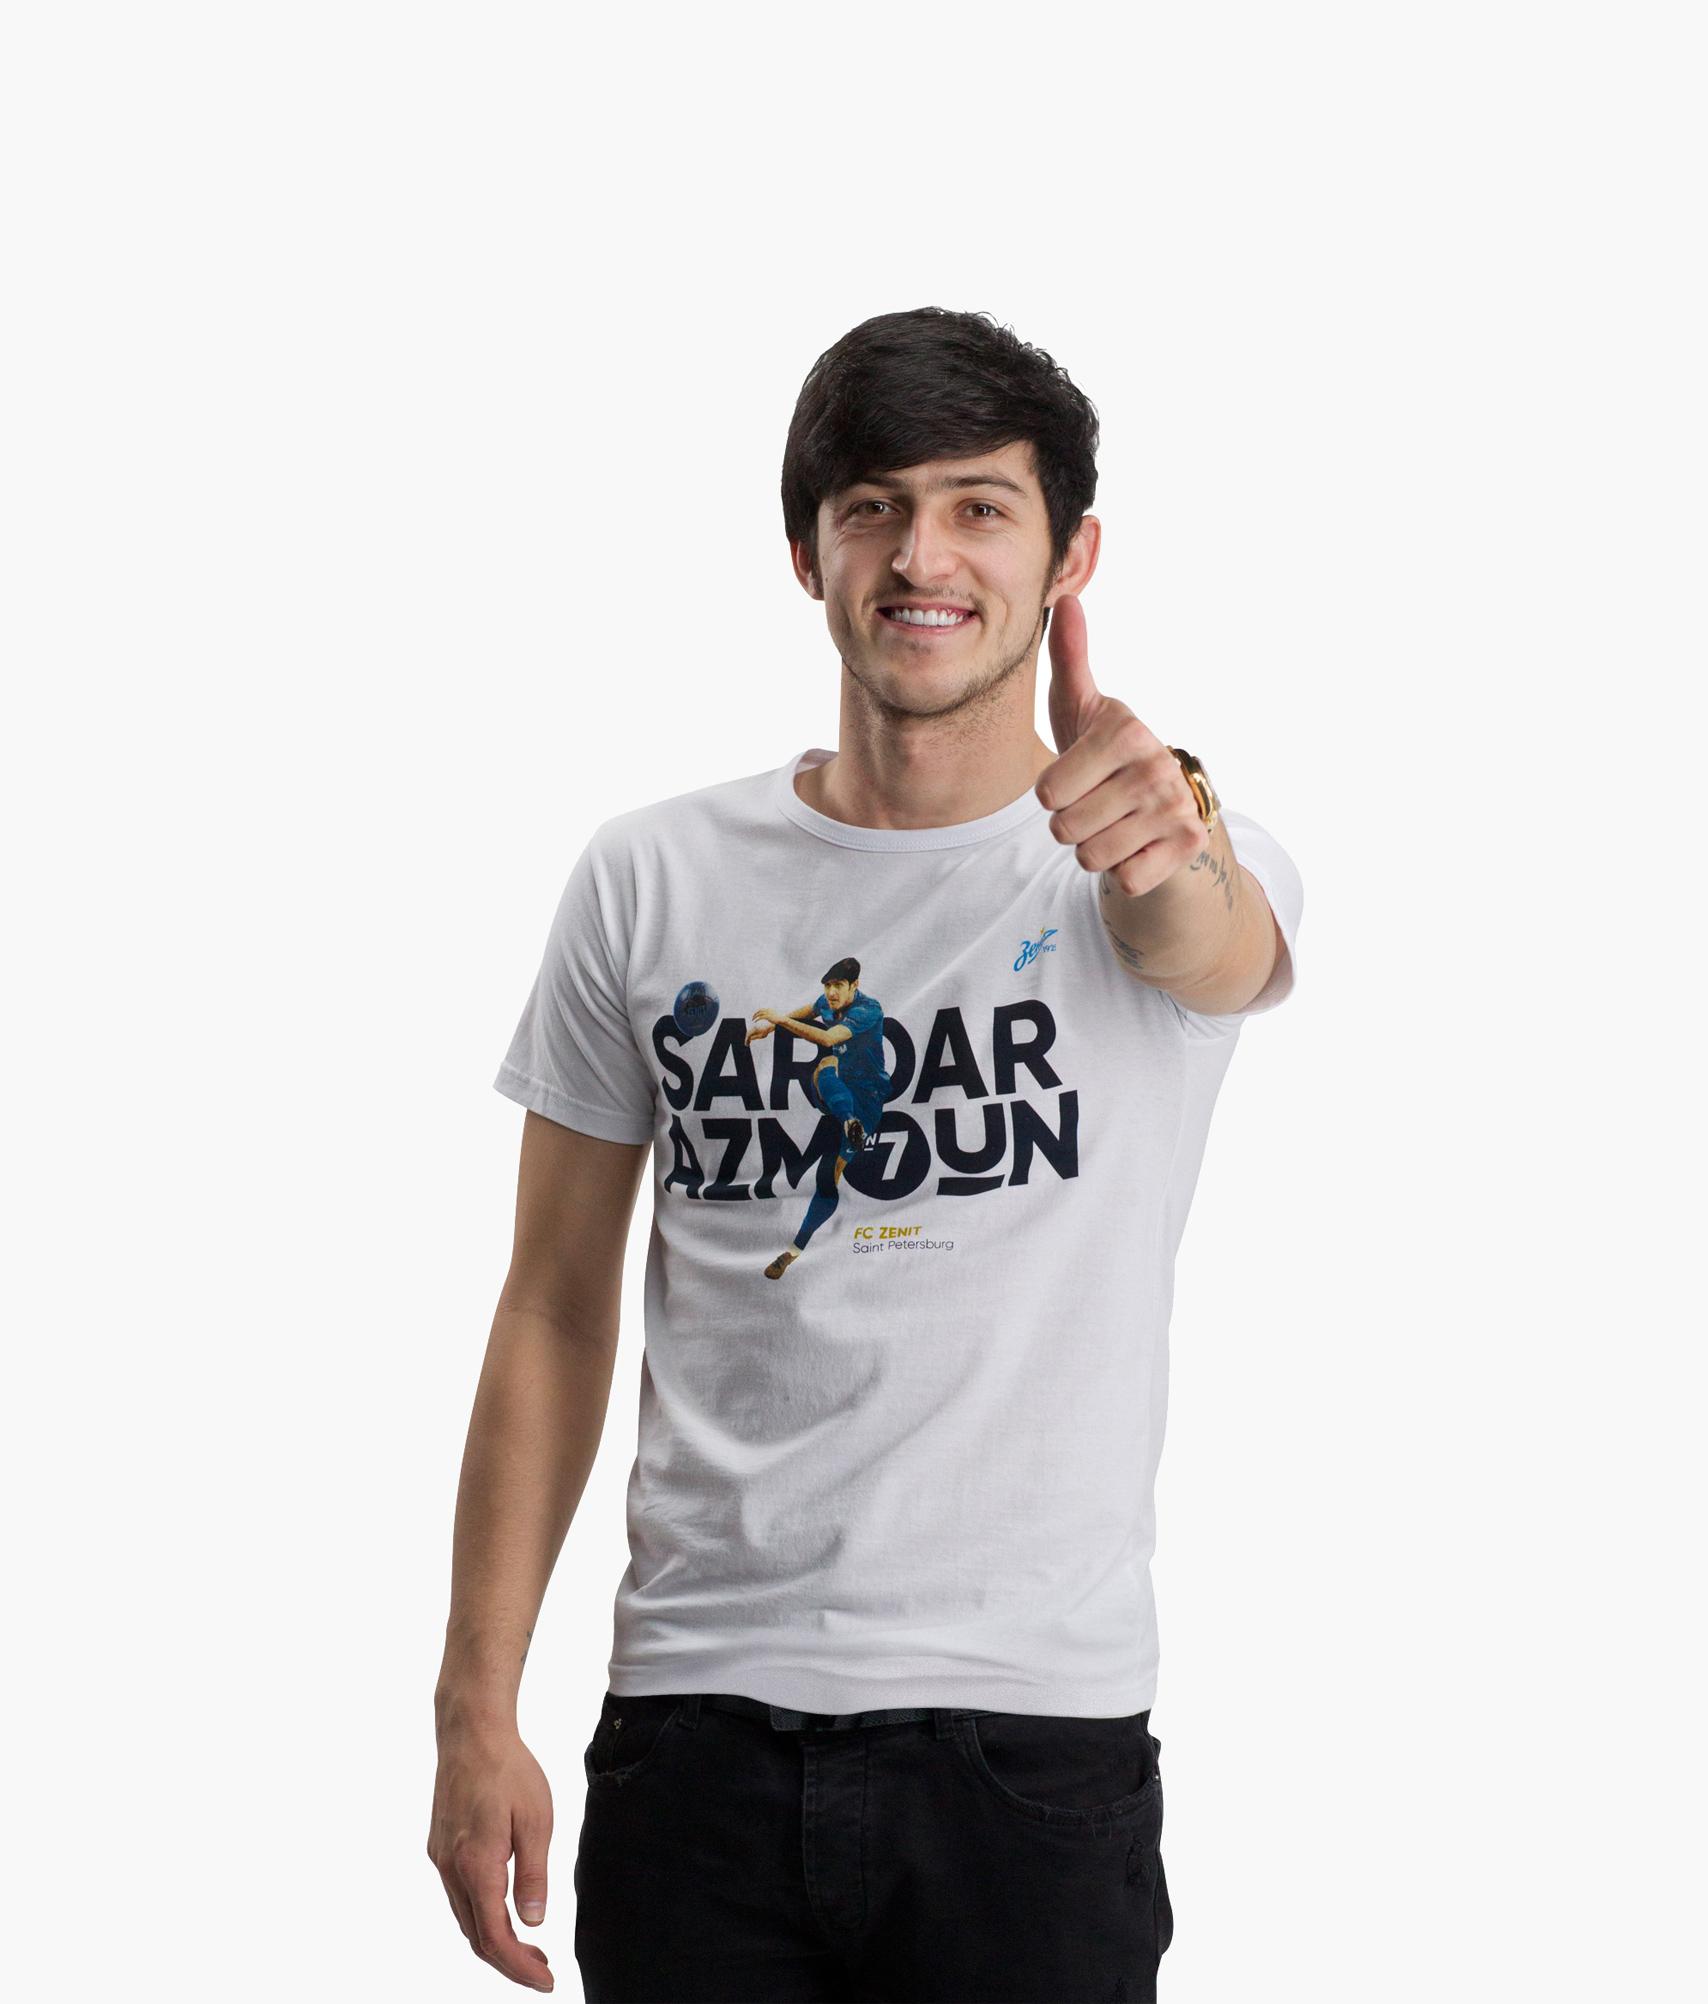 Футболка мужская #СердарАзмун Зенит Цвет-Белый